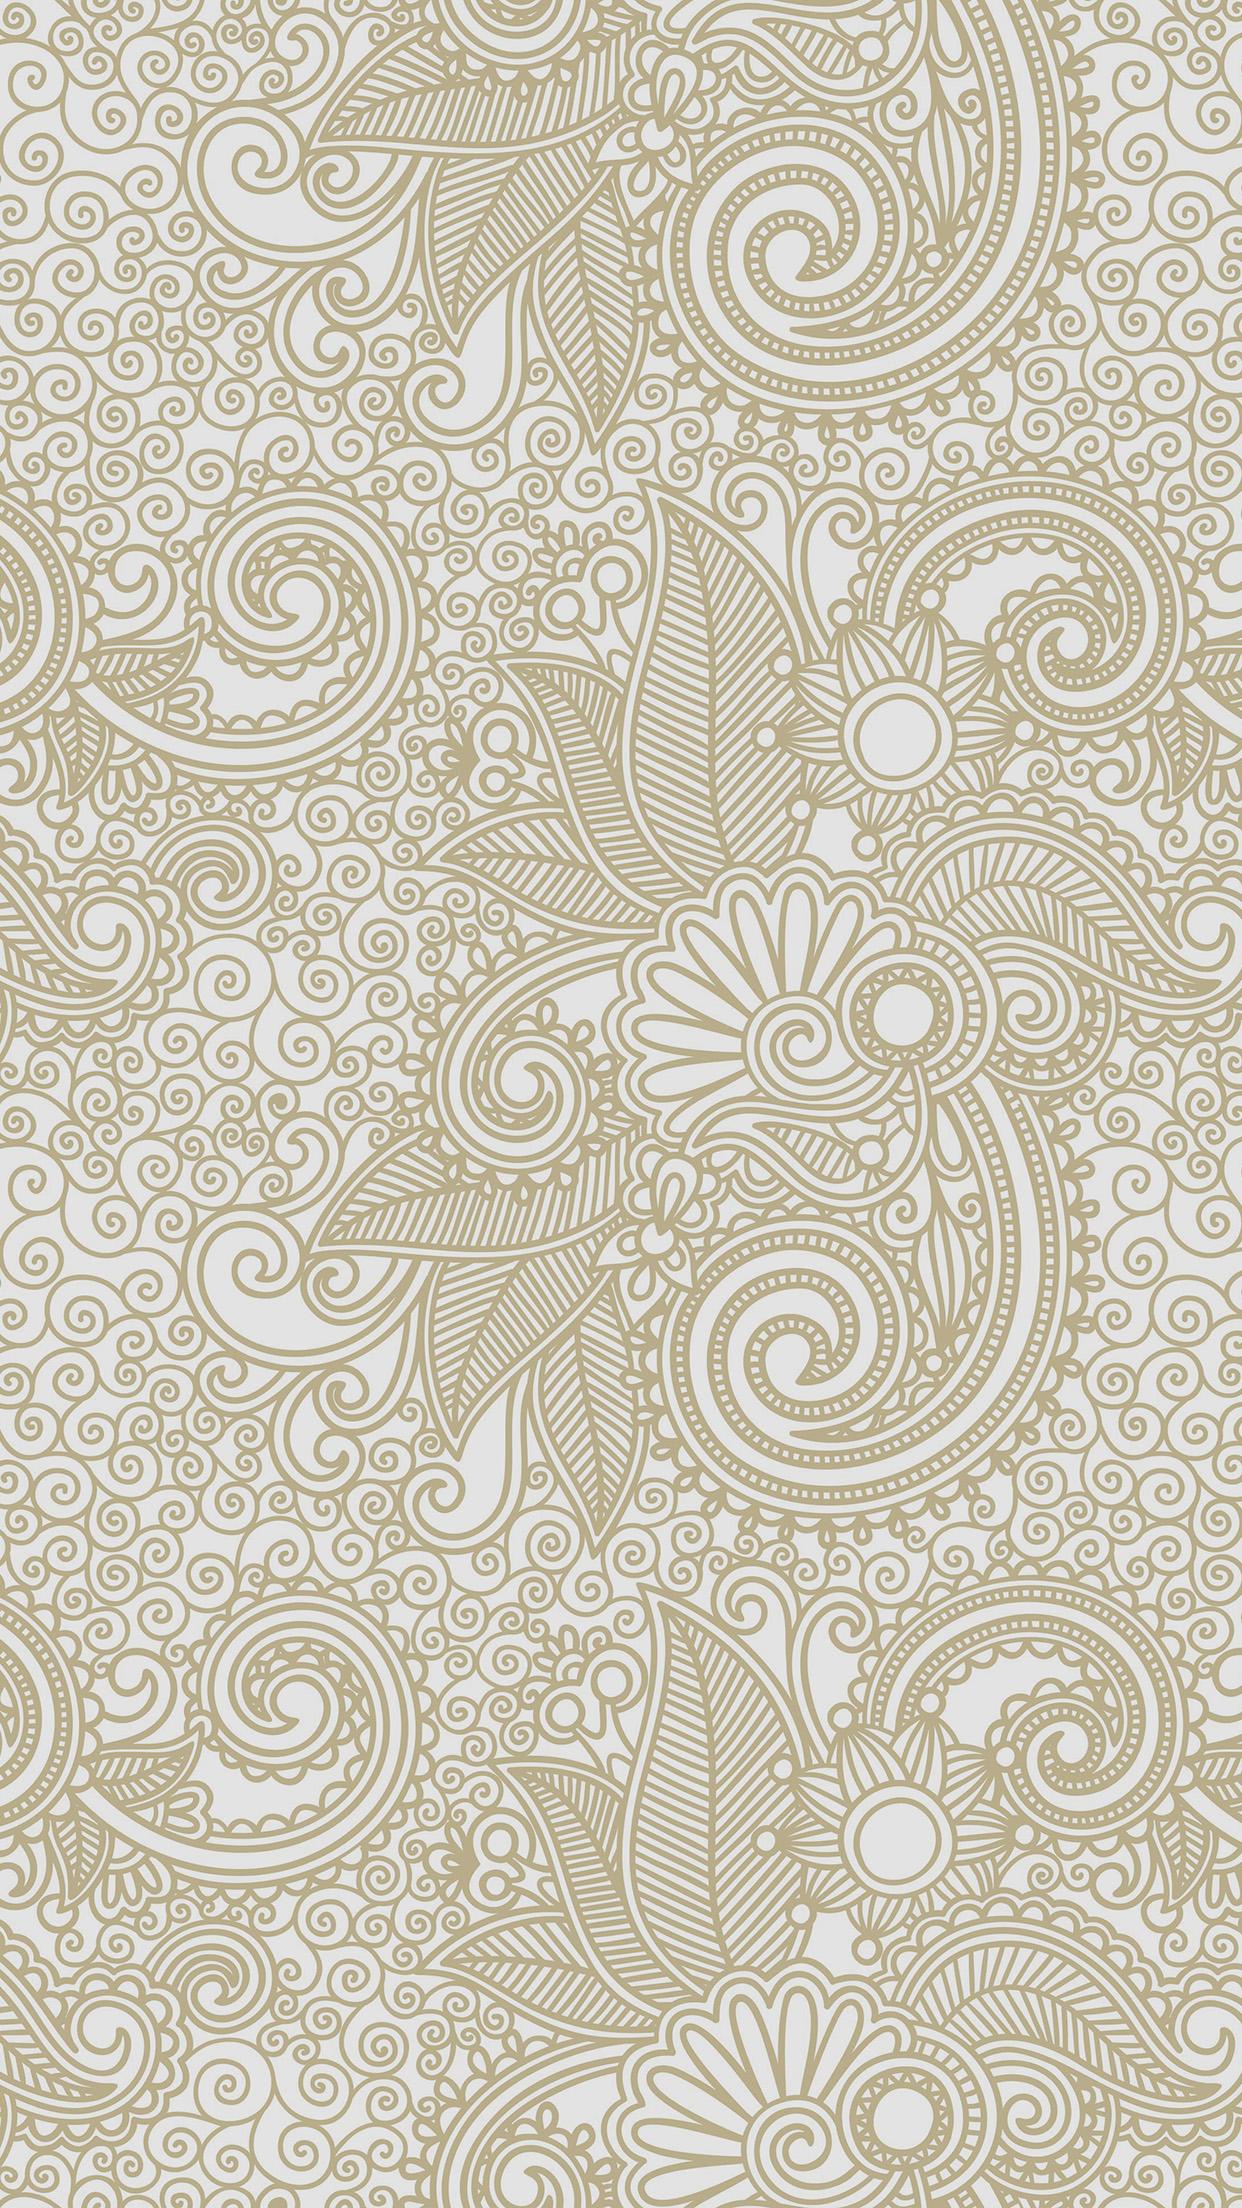 Iphone7papers Vk27 Wallpaper Design Flower Line Pattern